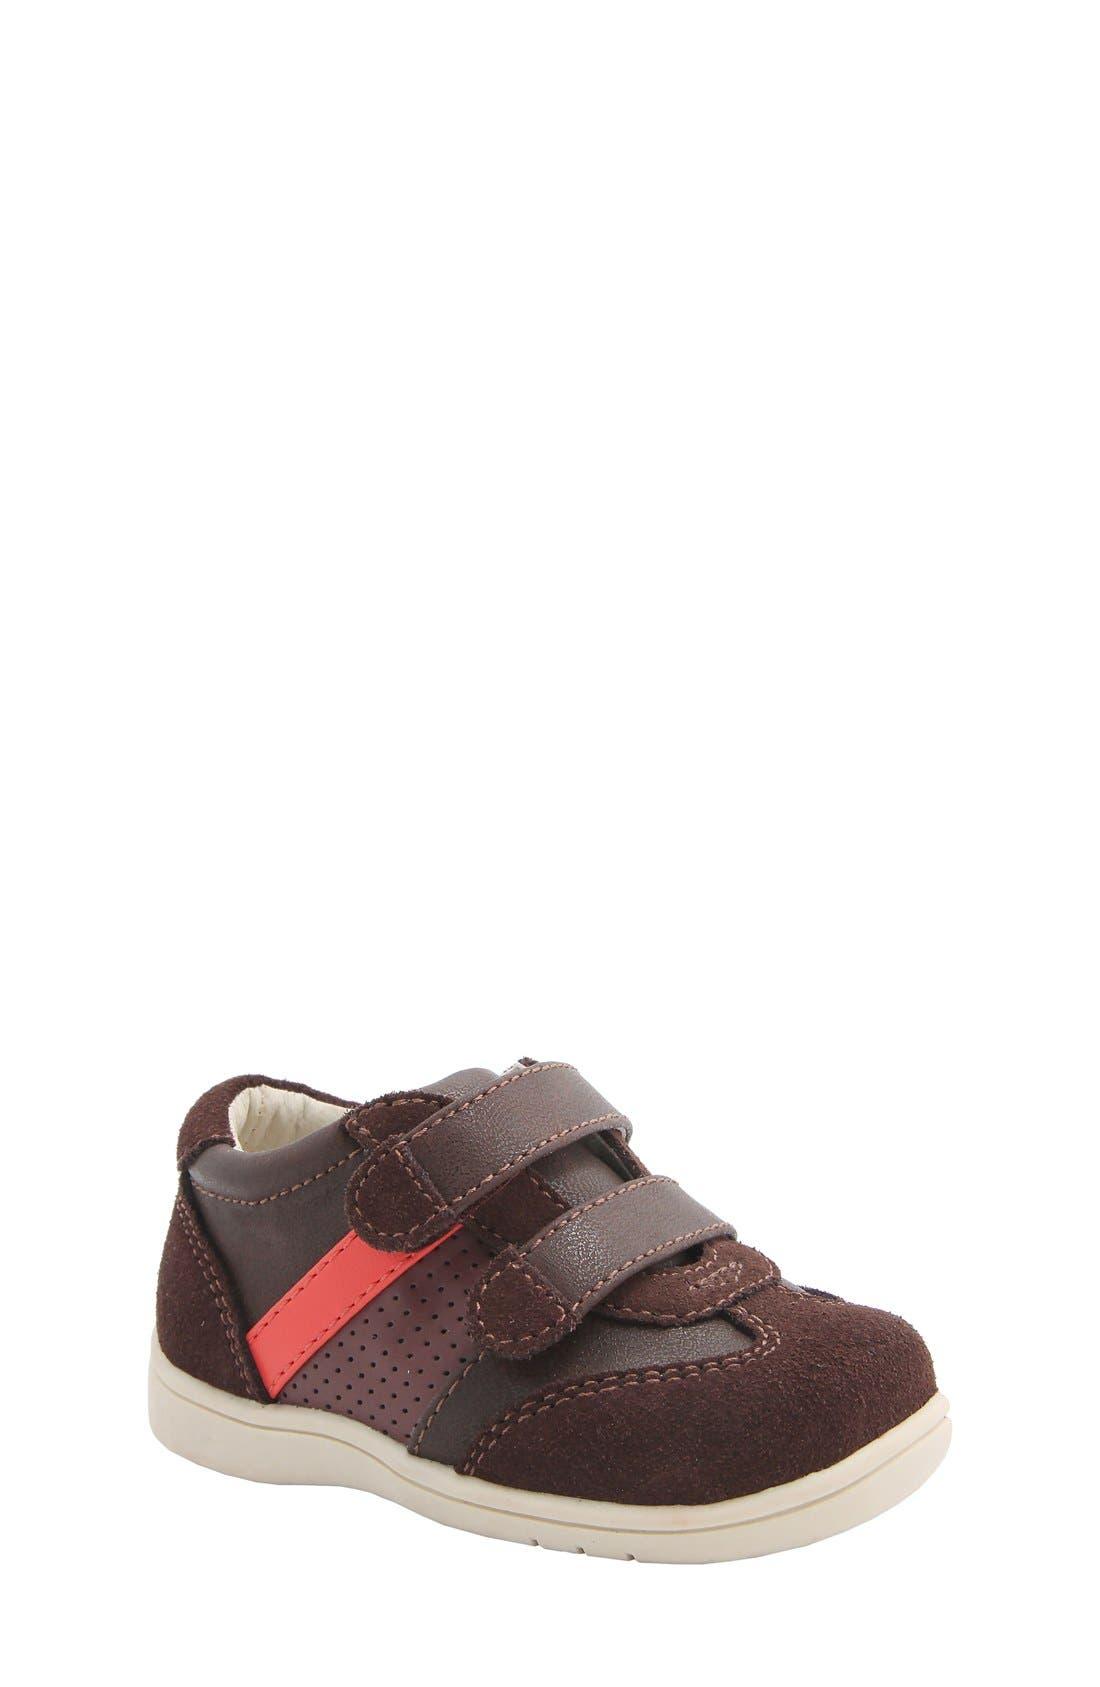 Main Image - Nina 'Everest' Sneaker (Baby & Walker)